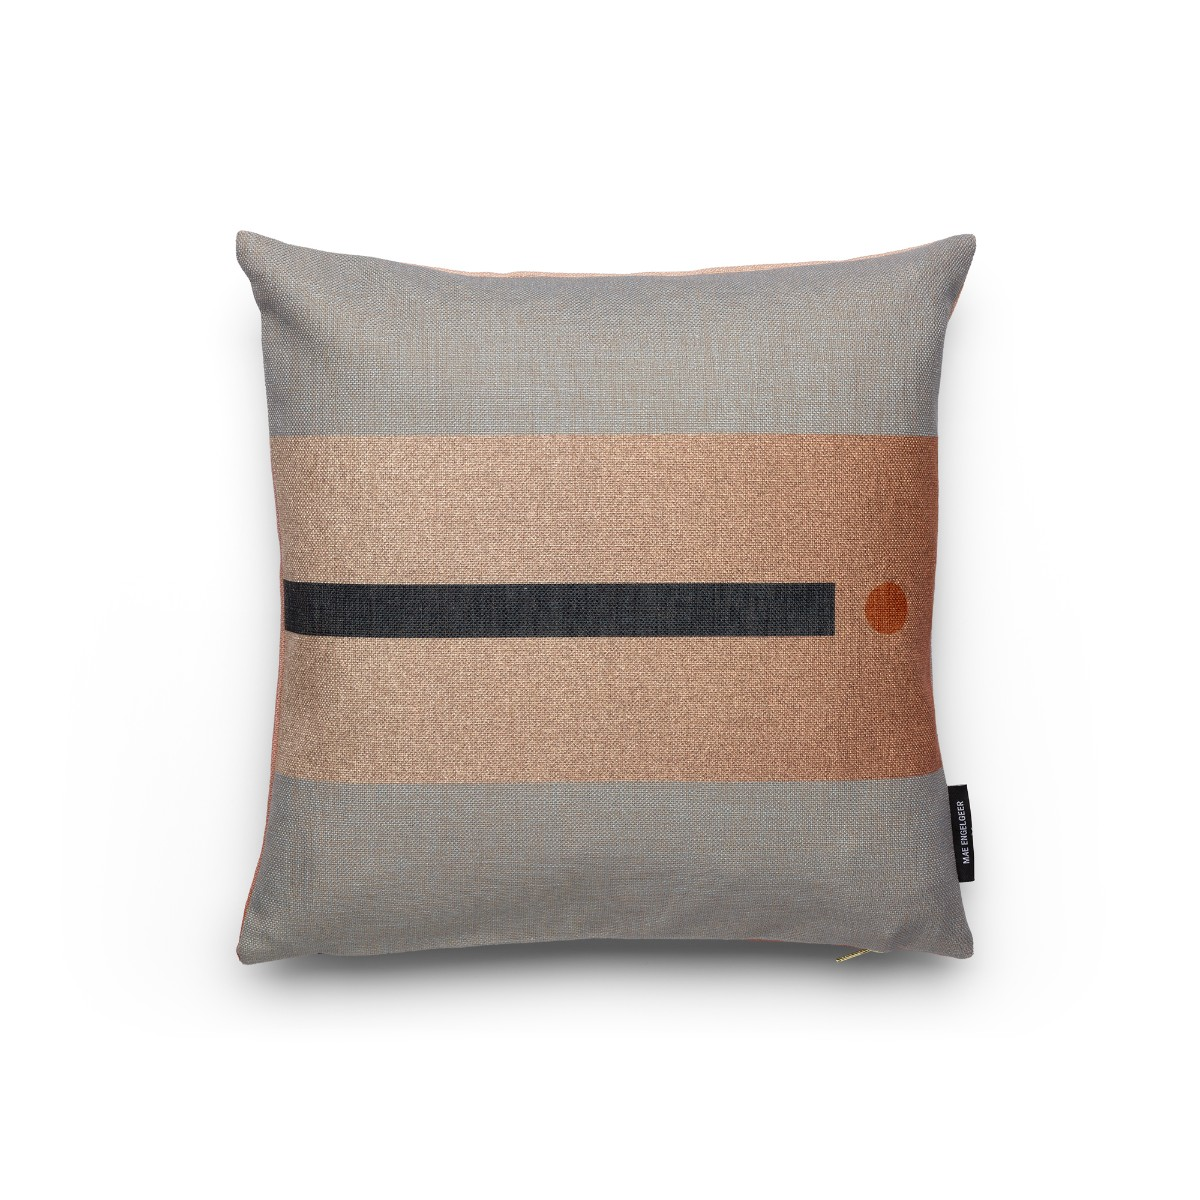 Fest I Dash Cushion (M. ENGELGEER) 45x45cm